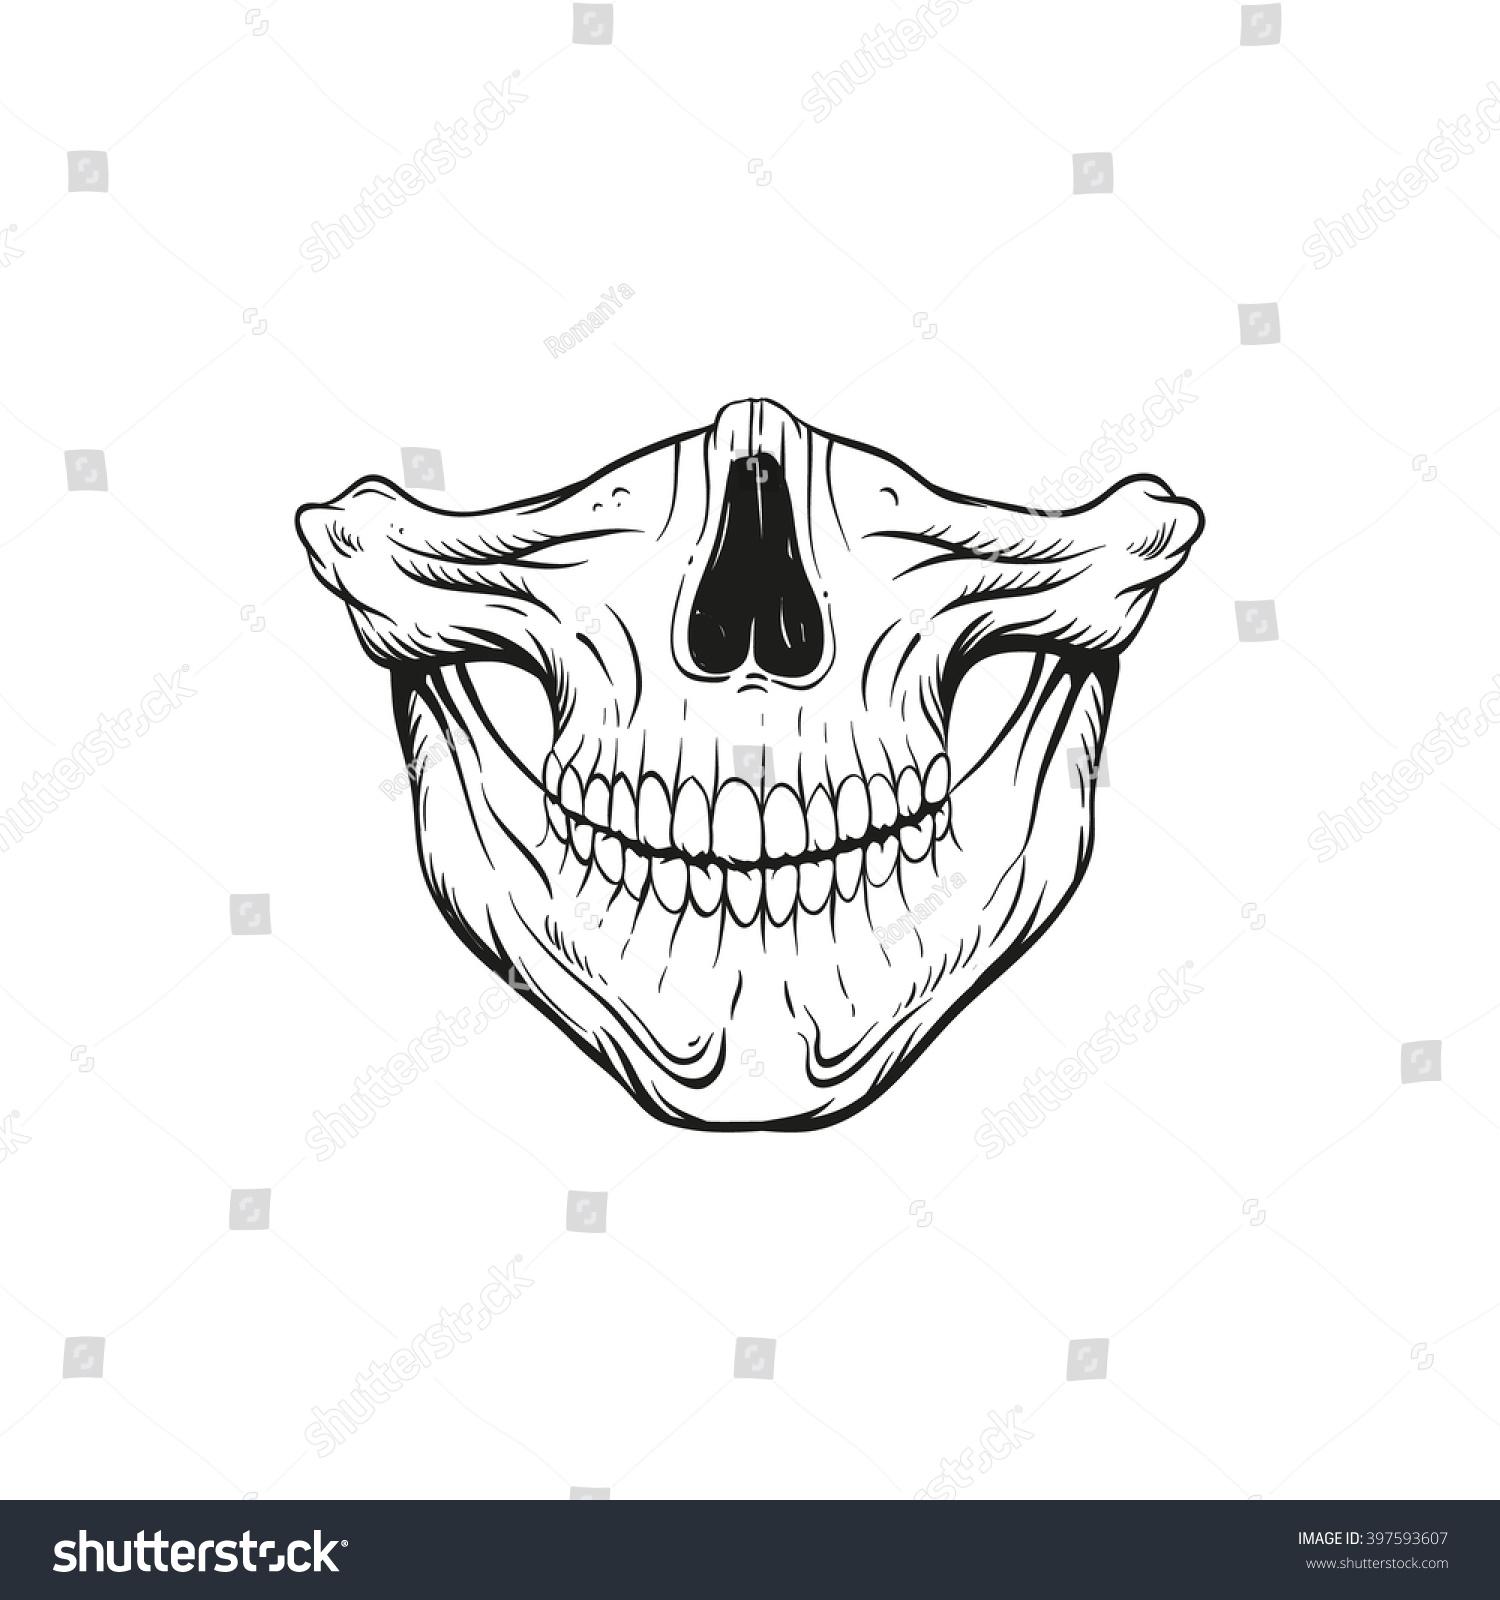 Skull Jaw Tattoo: Skull Jaw Sketch Tattoo Design Hand Stock Vector 397593607